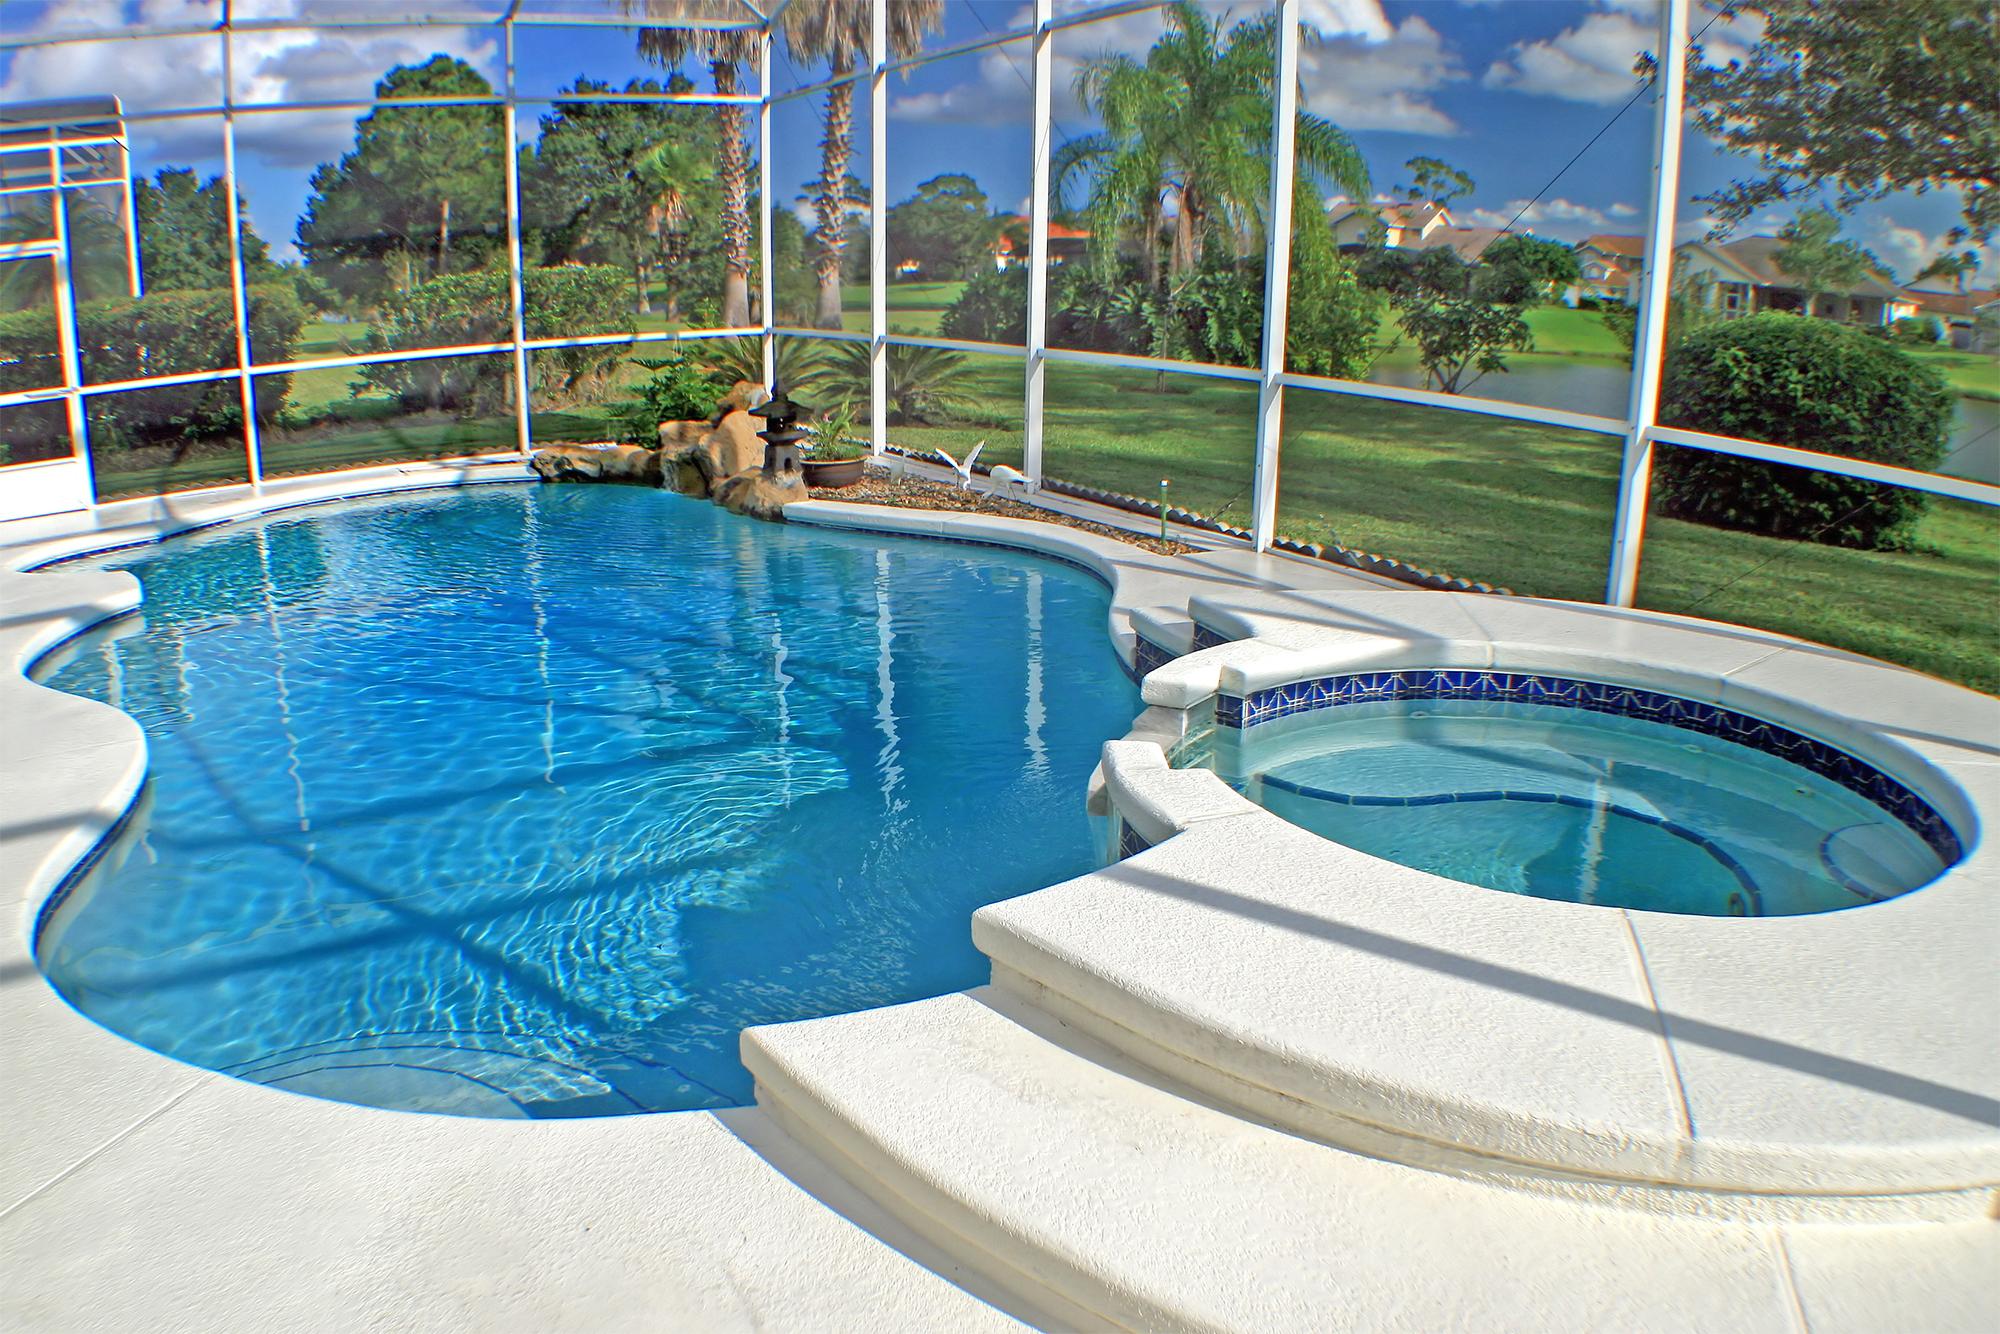 51ba0671c800 Swimming Pool Maintenance Tips For Bonita Springs Residents